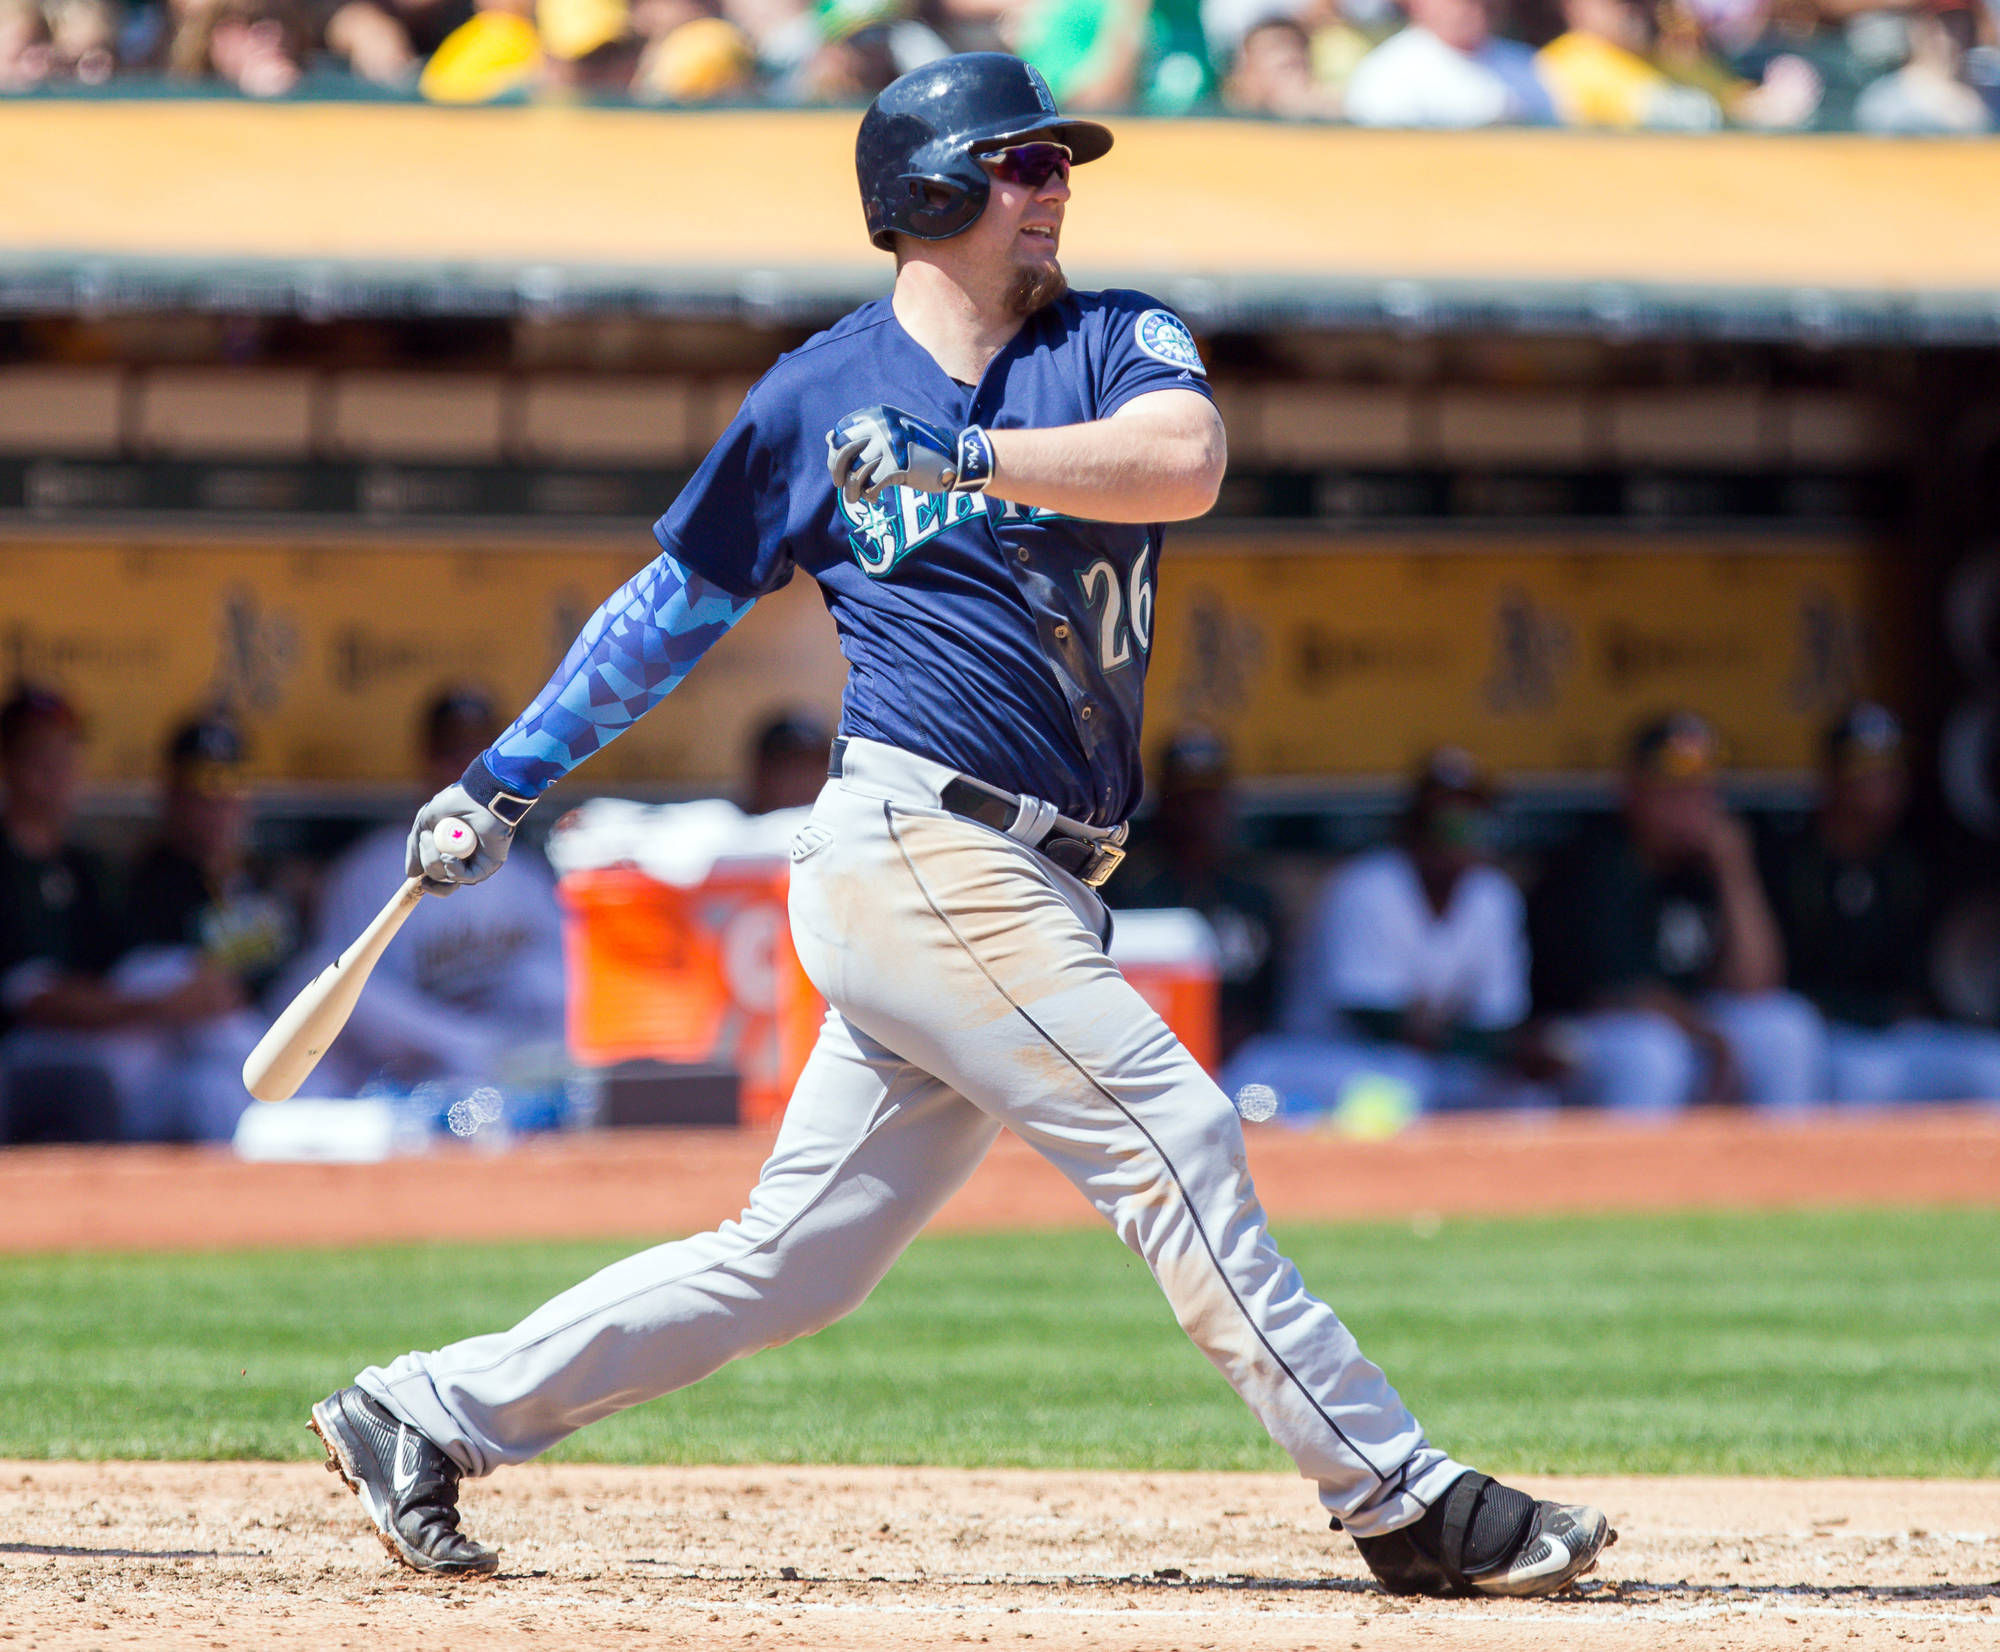 MLB Rumors: Adam Lind to the Phillies?